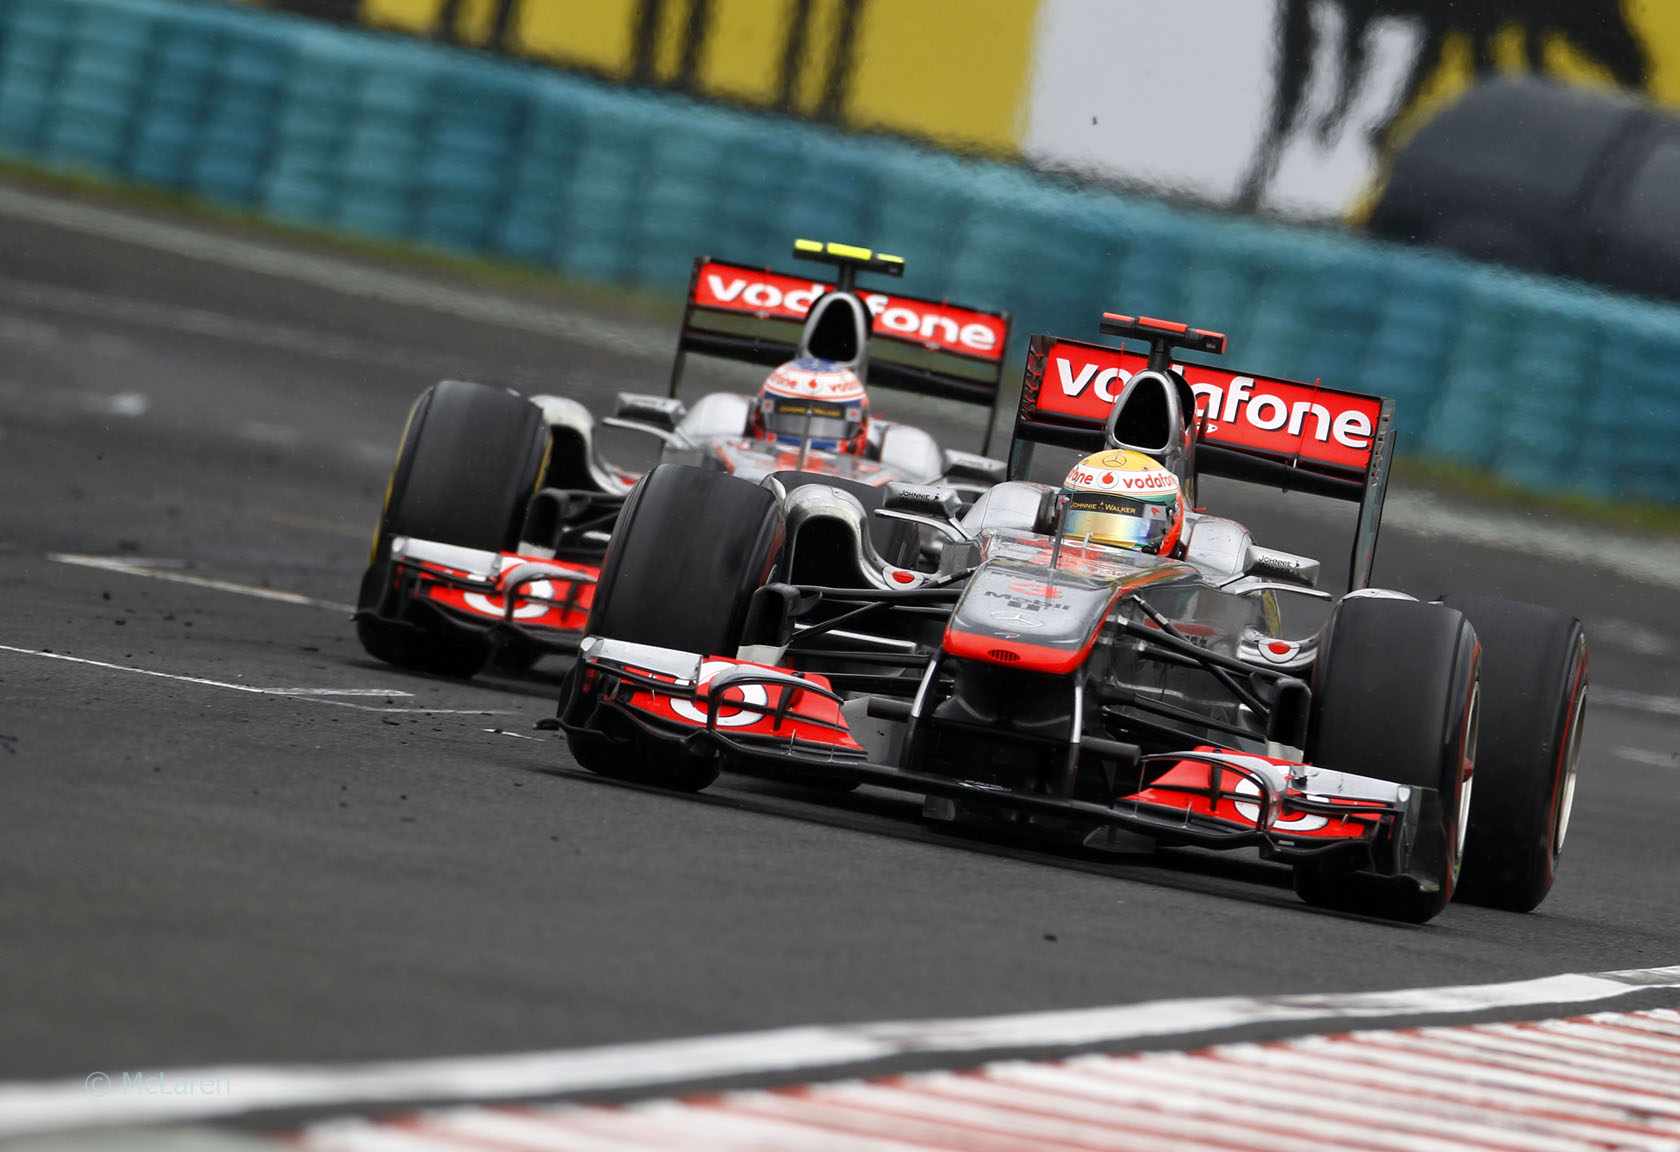 McLaren: Best Dressed Team In F1 2012?